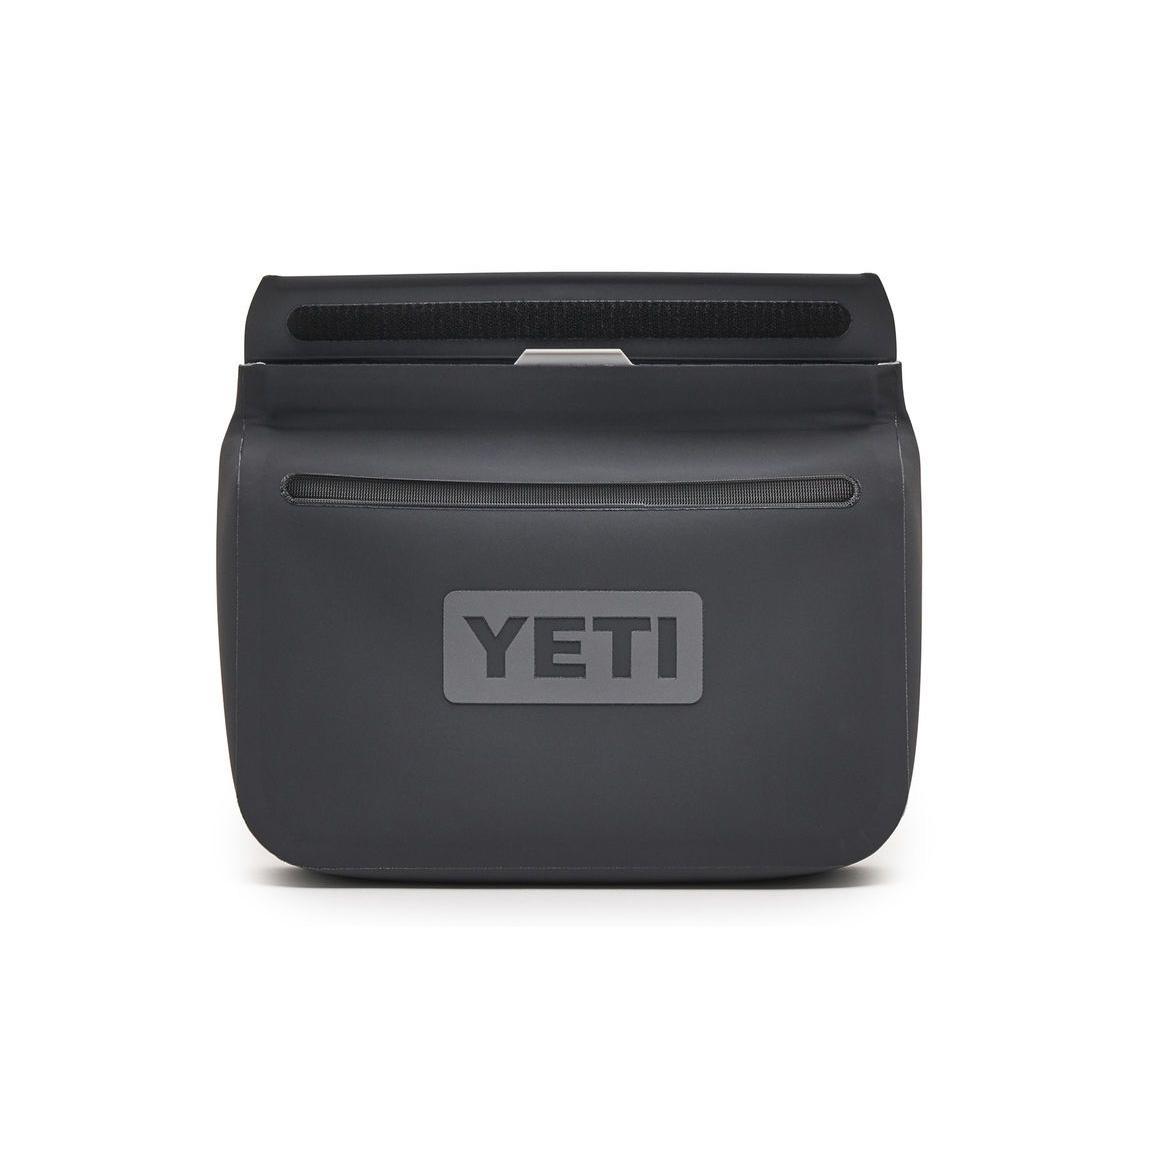 yeti-sidekick-bag-front-open